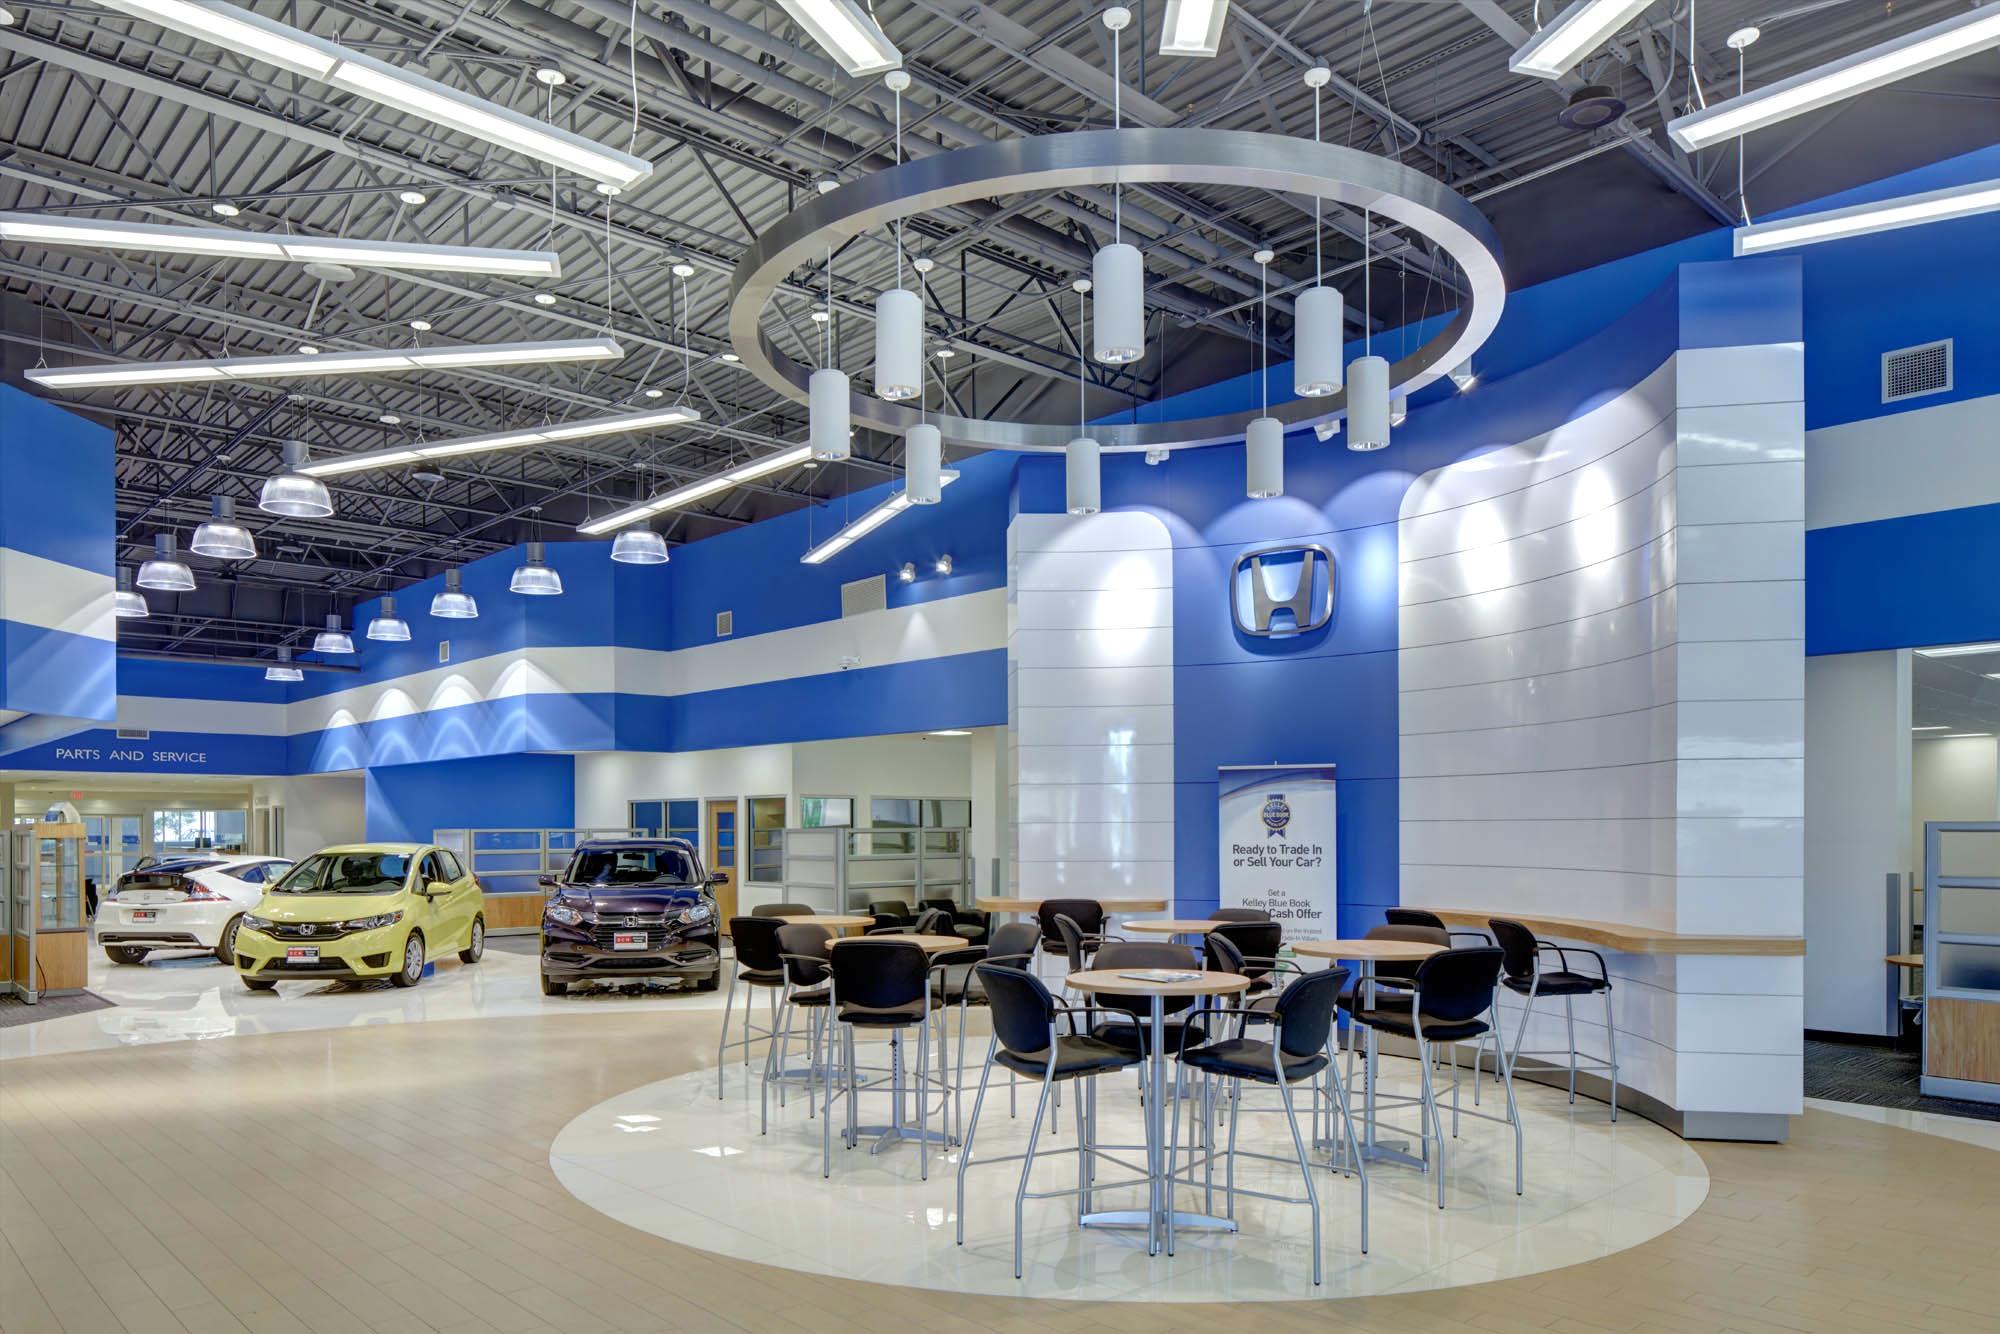 Dch paramus honda dealership built by mc gowan for Honda dealership paramus nj